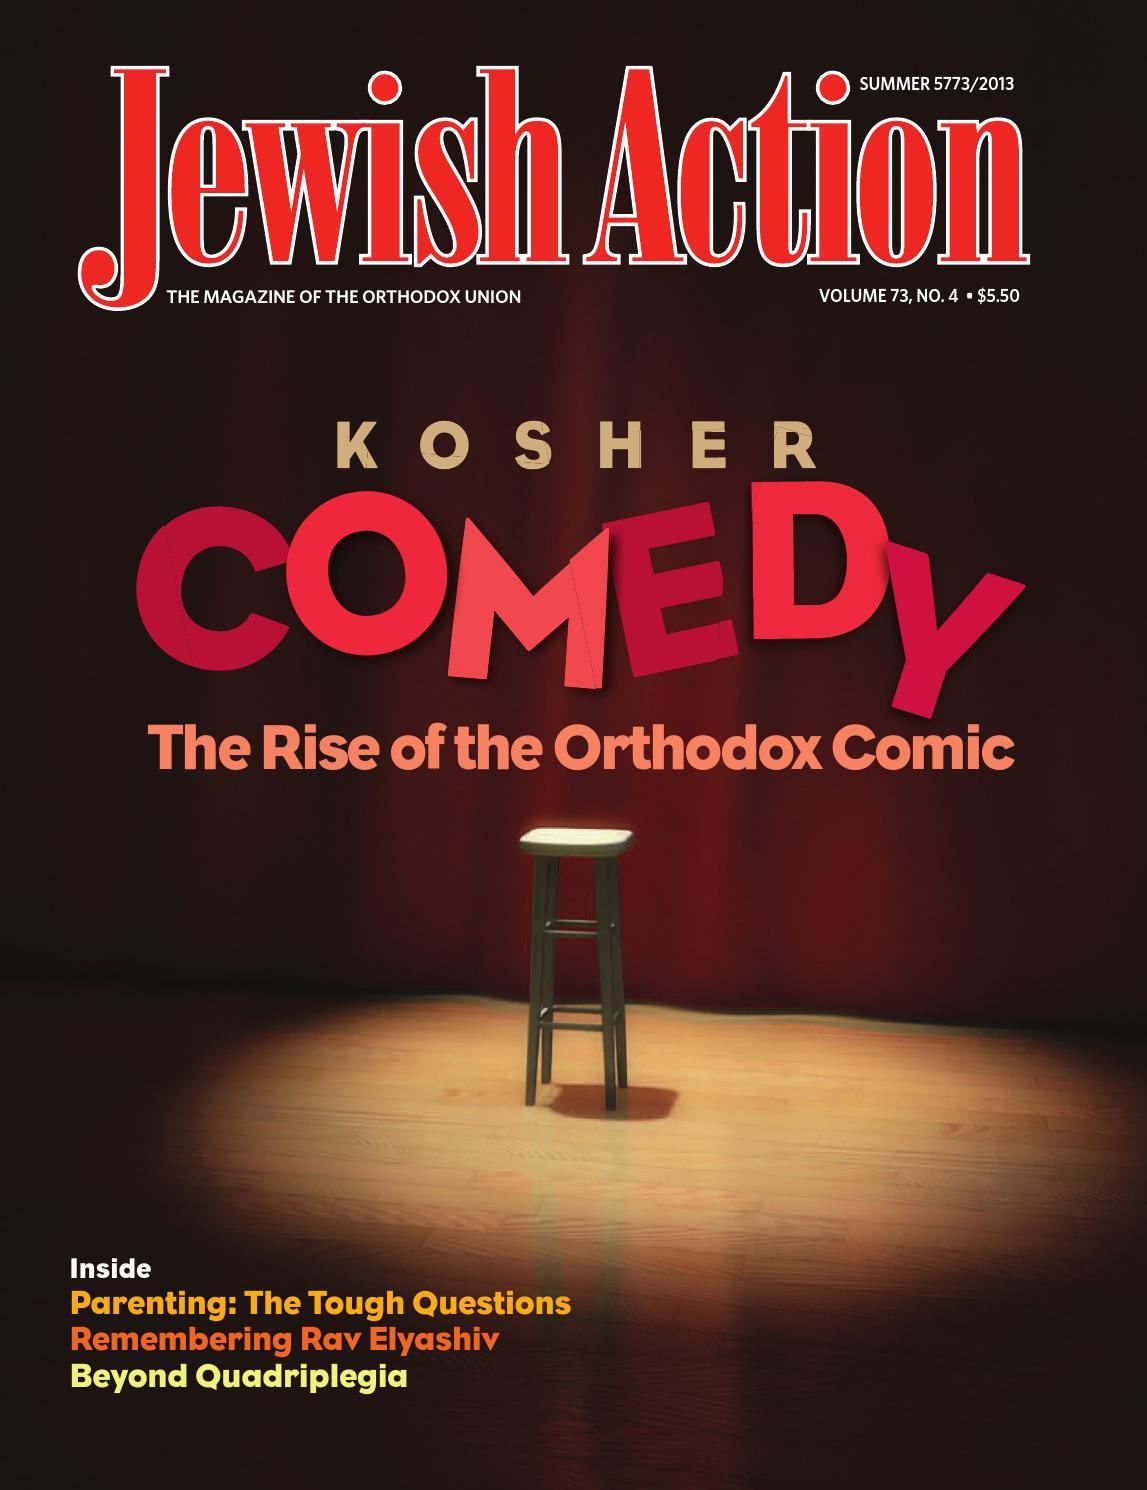 Jewish Action Summer 2013 by Orthodox Union - issuu